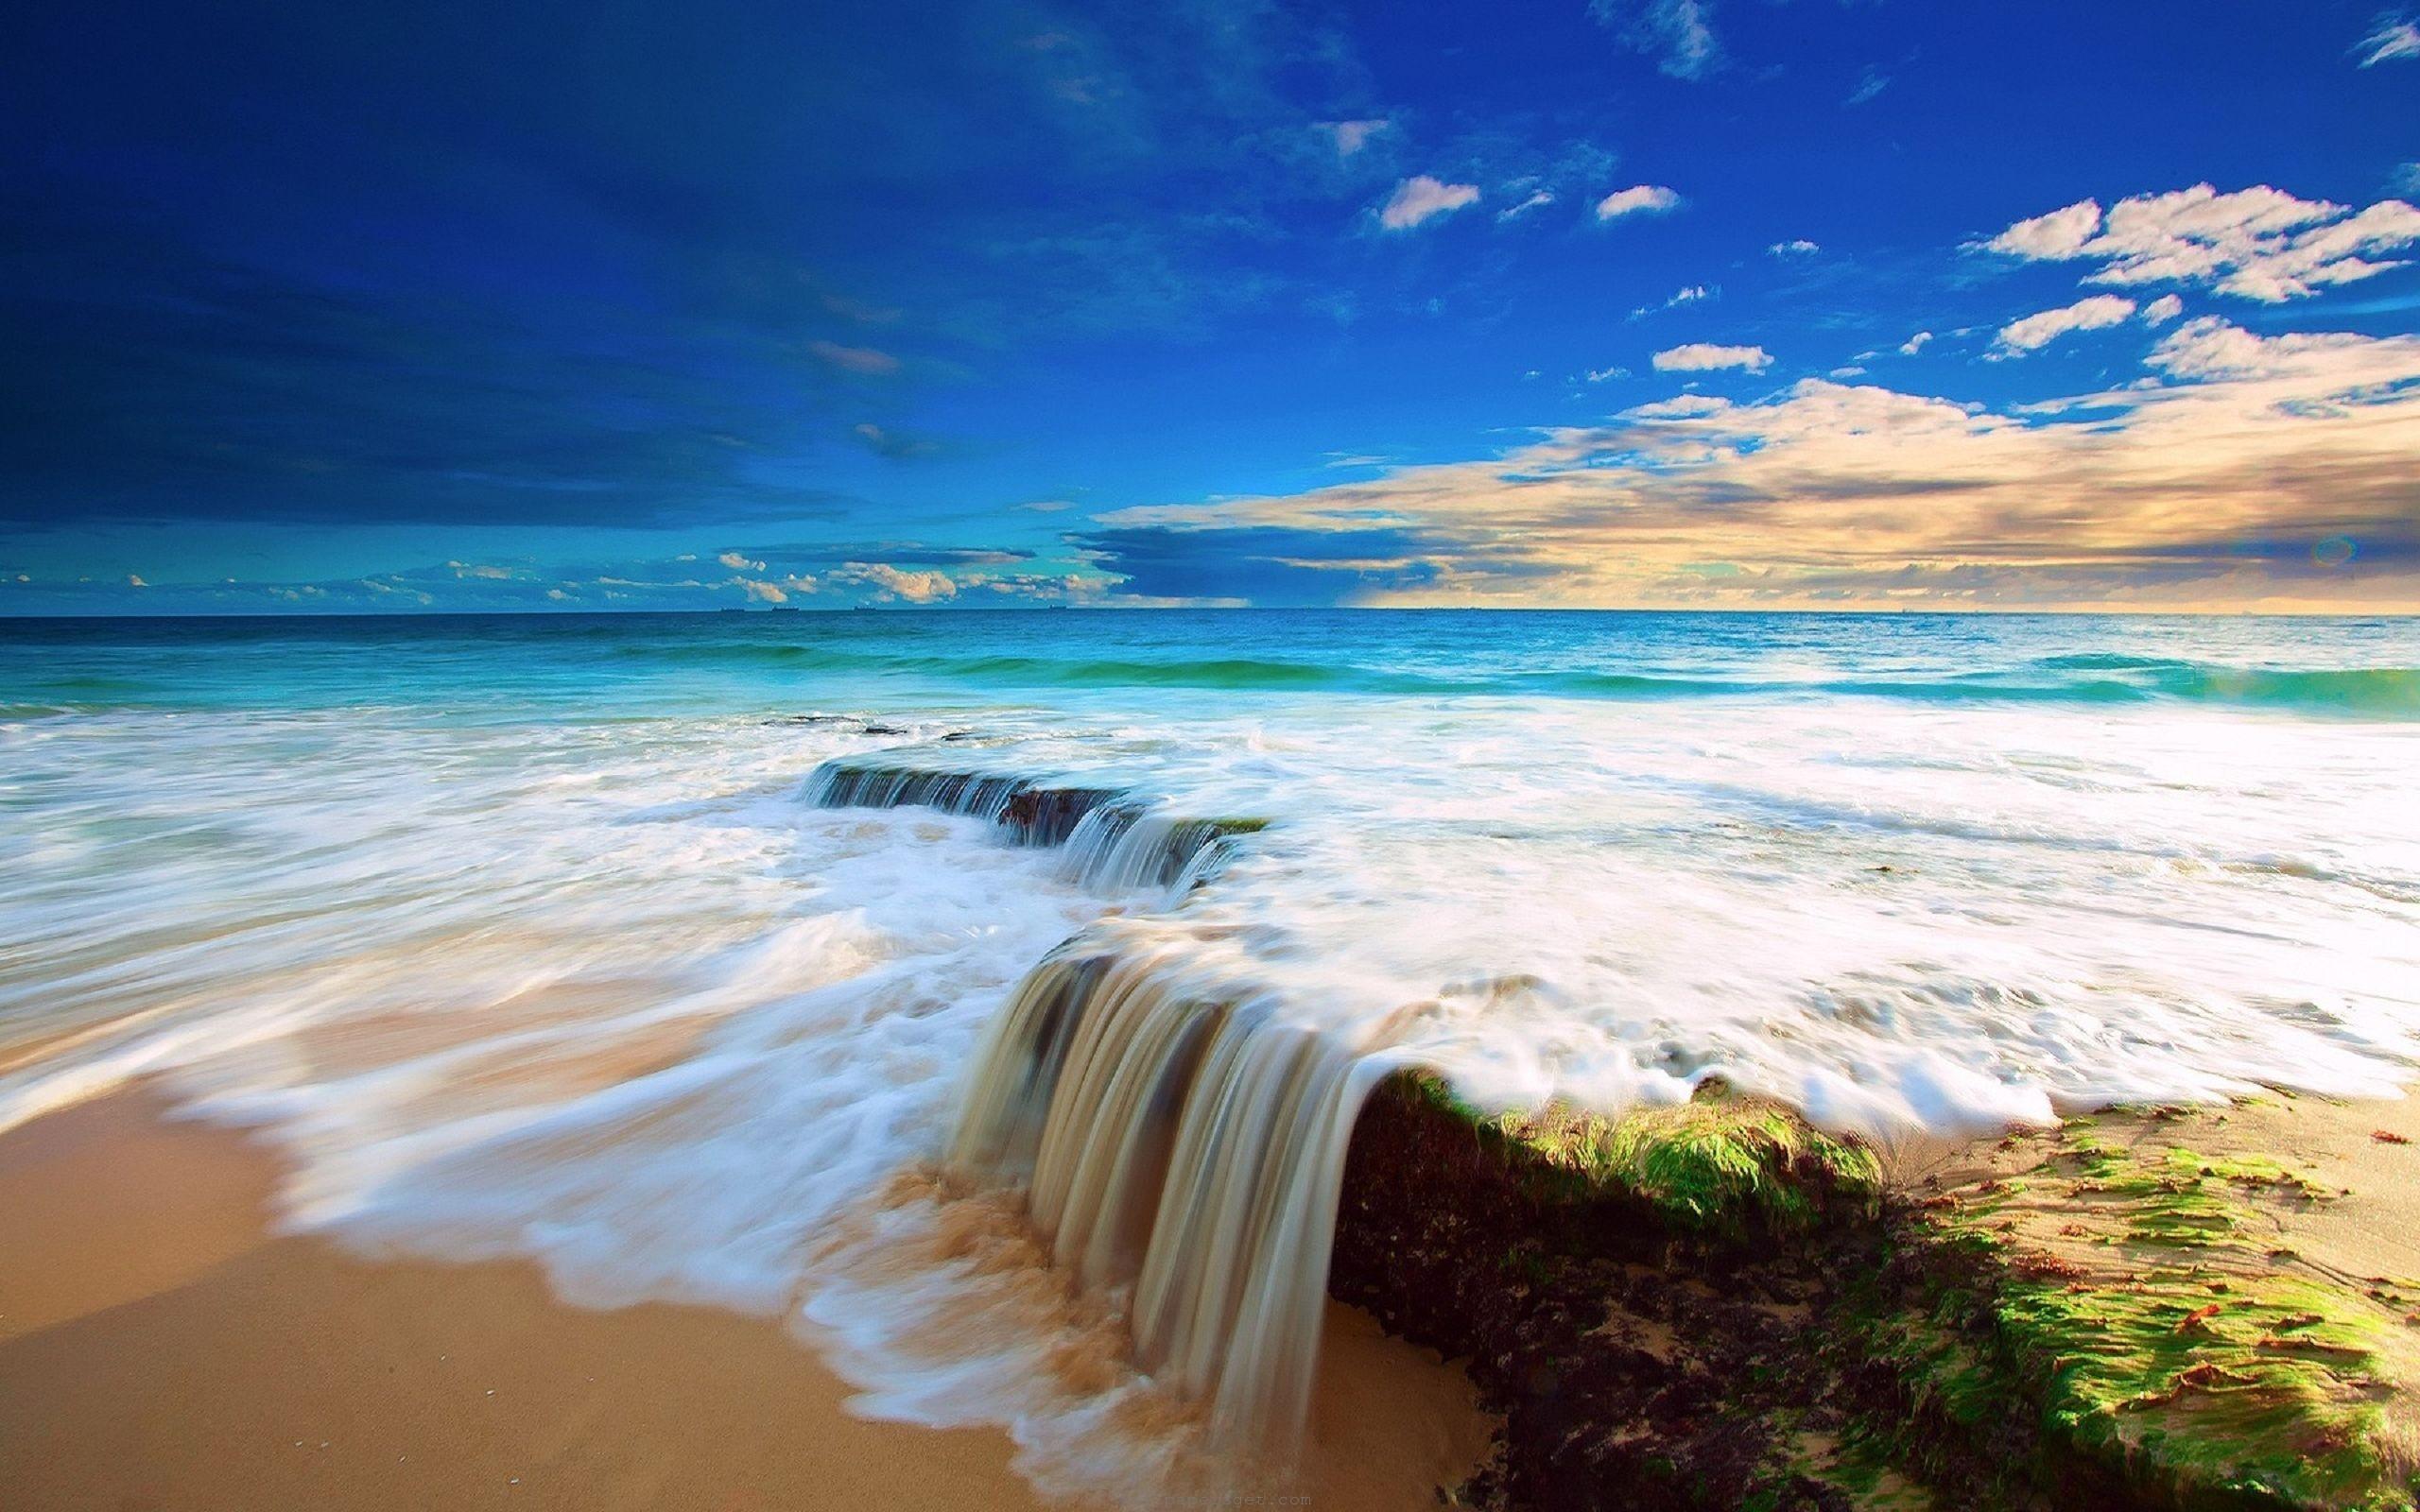 Ocean Waves Water Favim Com HD dekstop wallpapers   Beach Ocean Waves 2560x1600